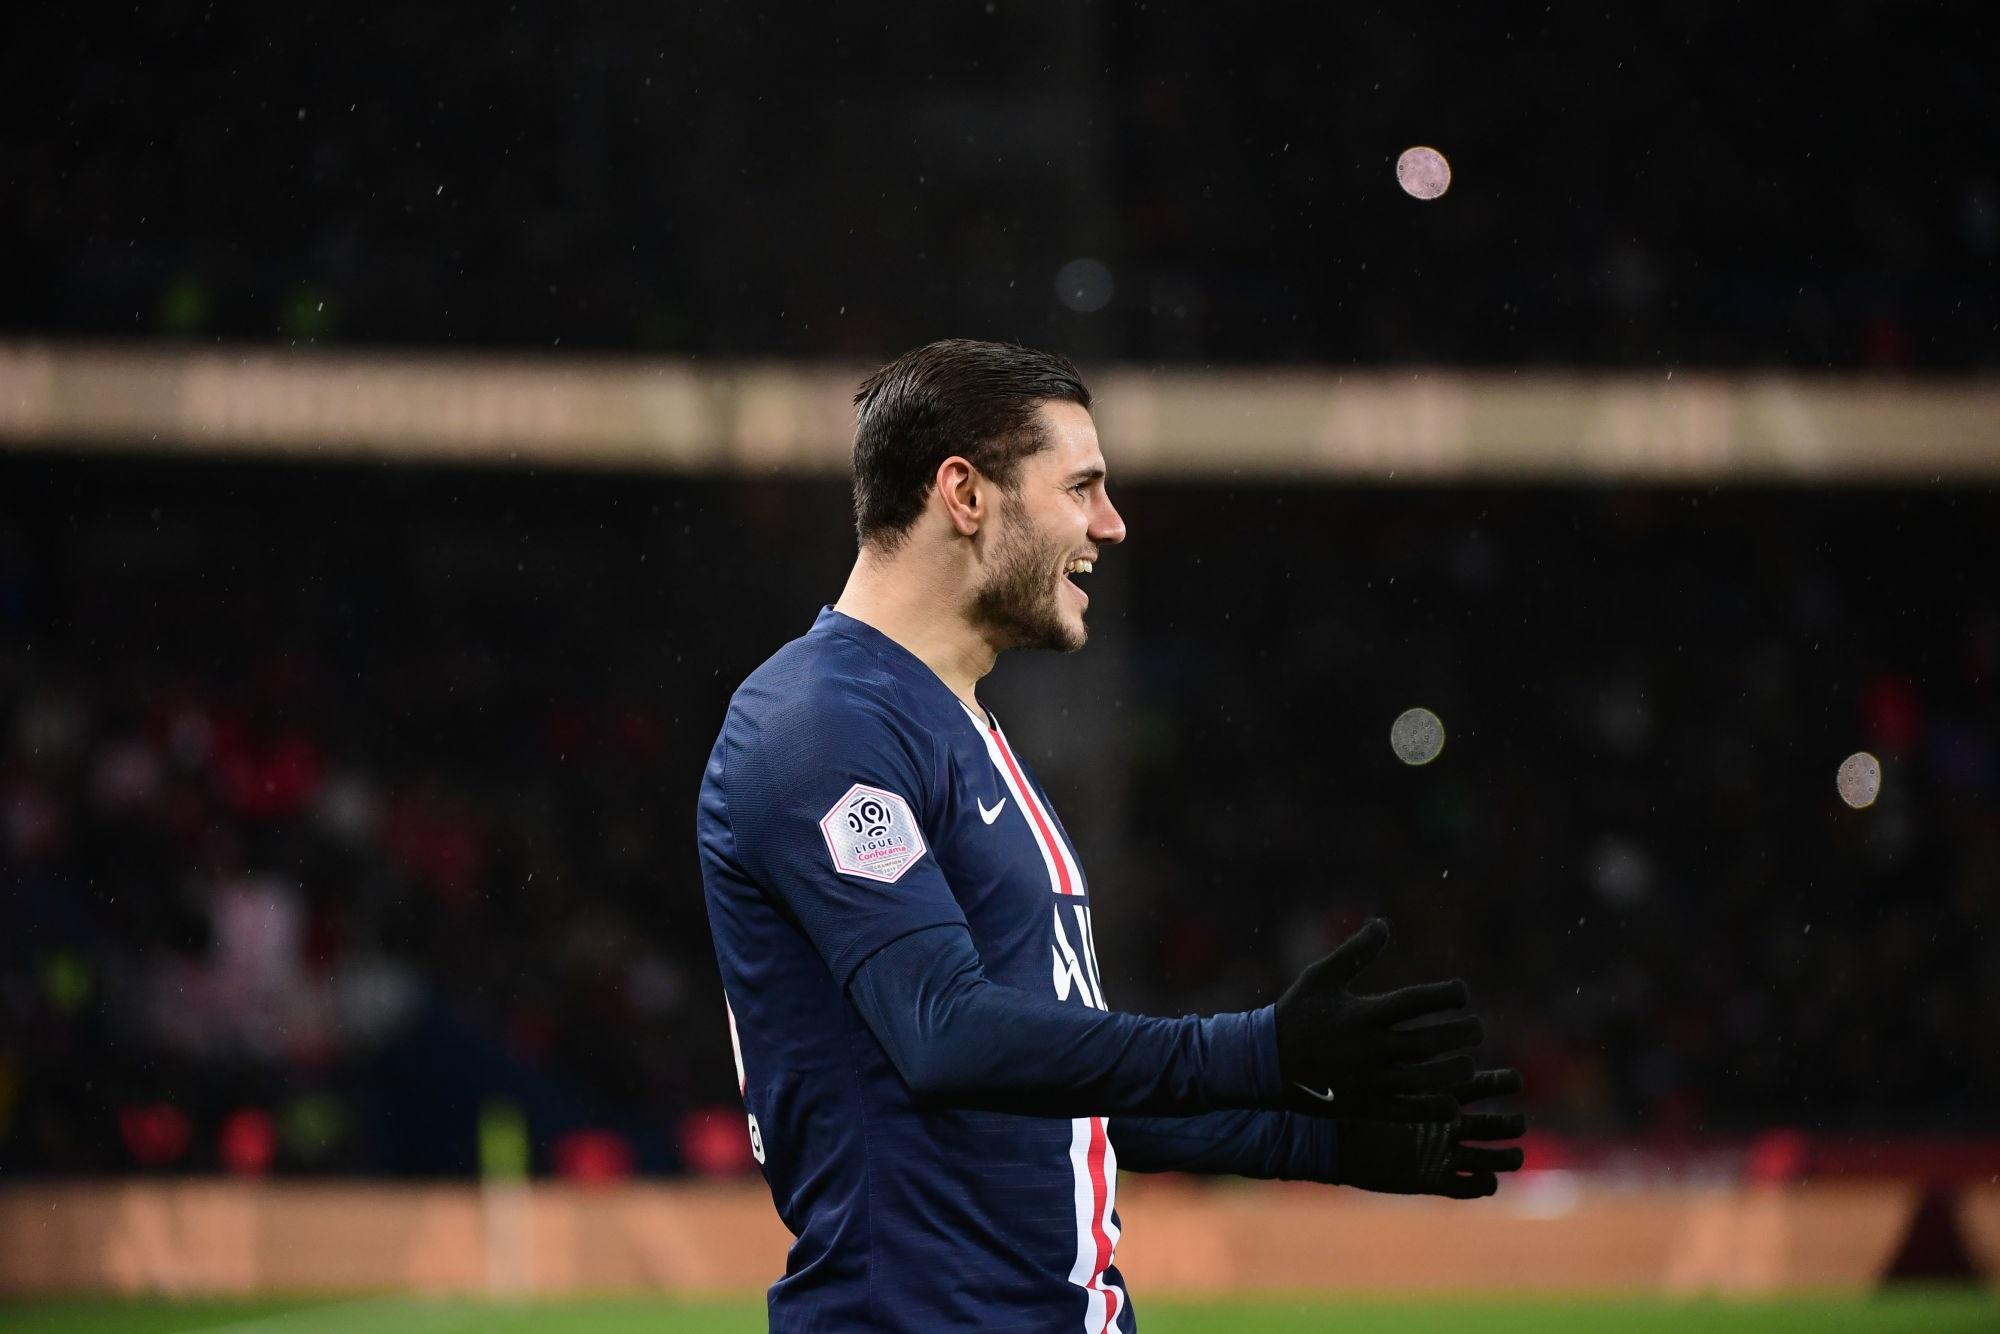 Mercato - Icardi reste au PSG, l'accord est trouvé selon le Corriere dello Sport